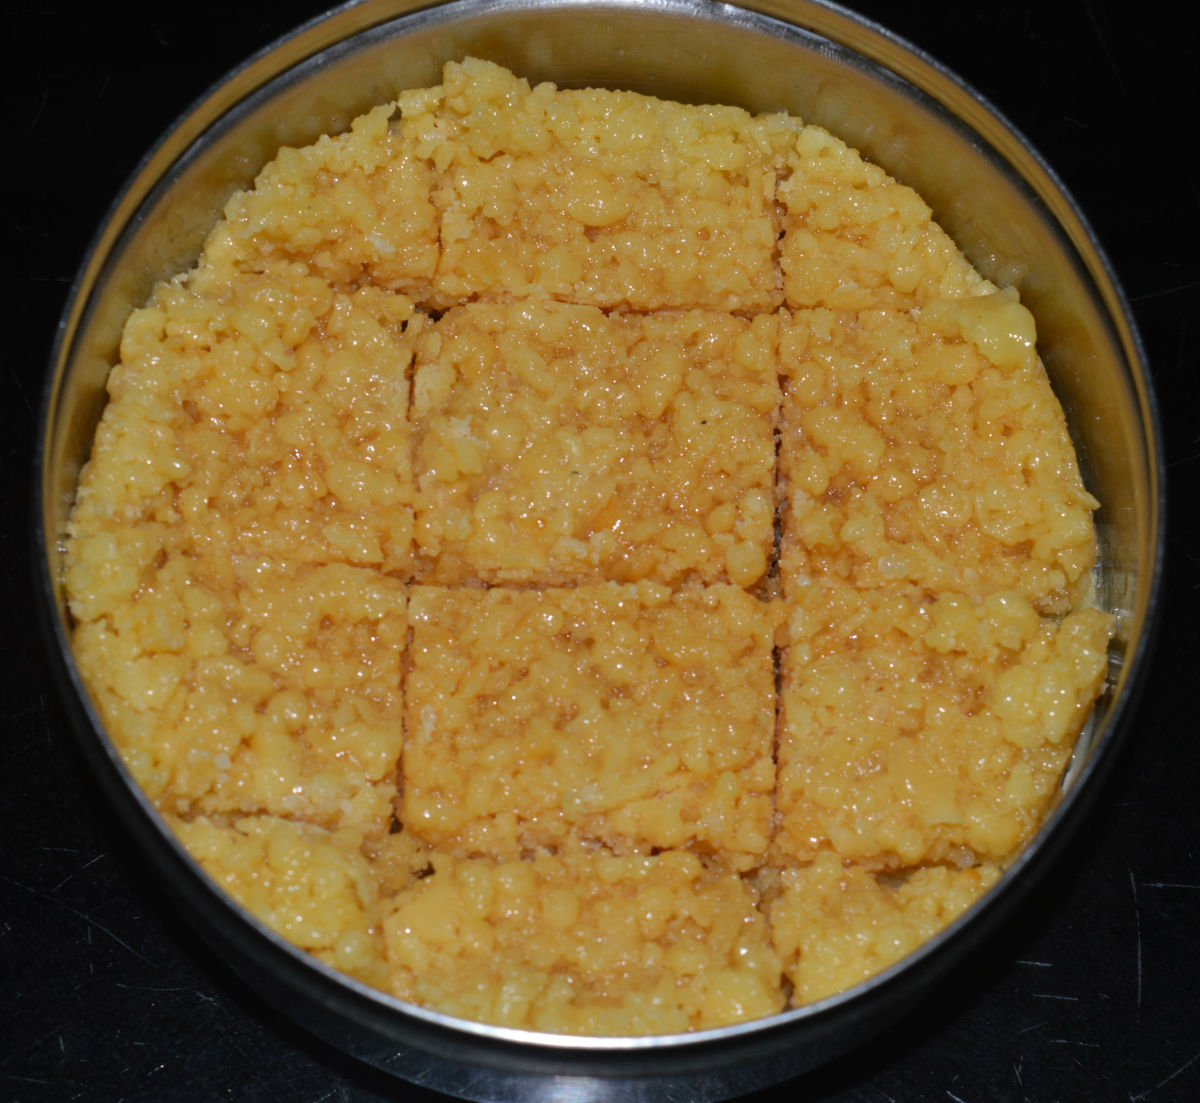 Making Milk Cake (Kalakand), an Authentic Indian Dessert